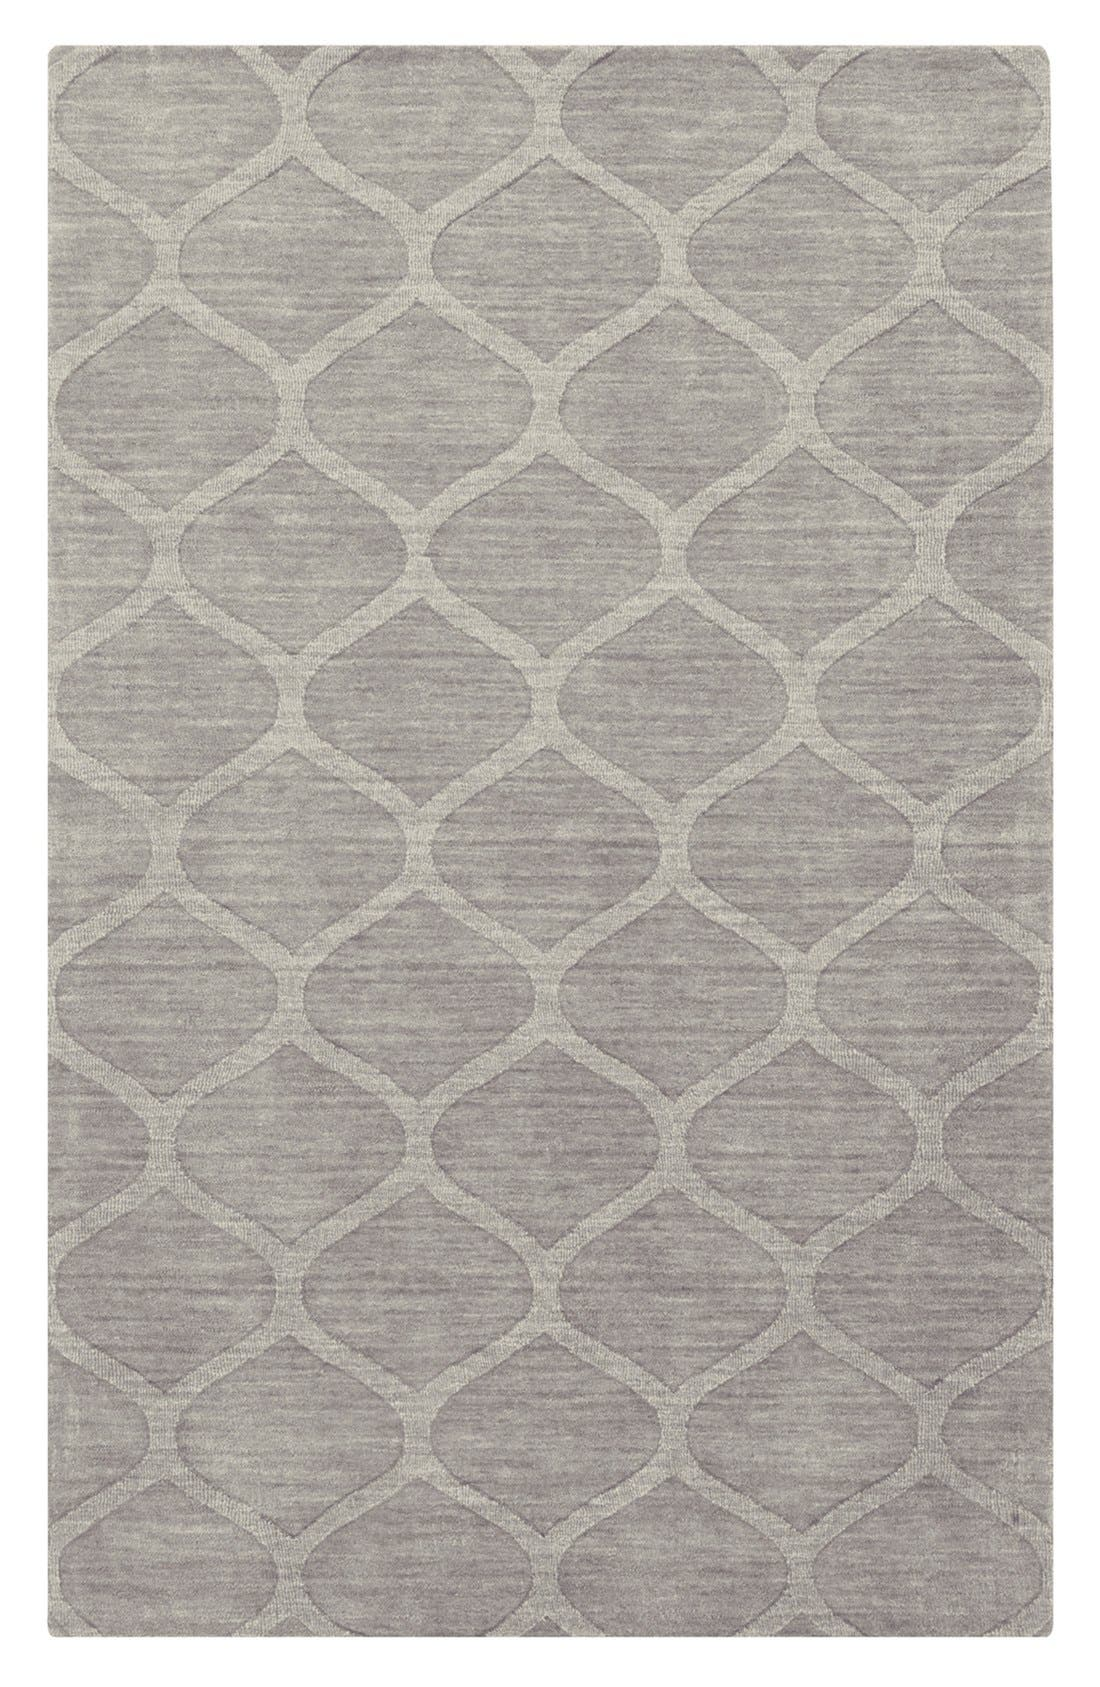 'Mystique' Hand Loomed Wool Rug,                         Main,                         color, Grey